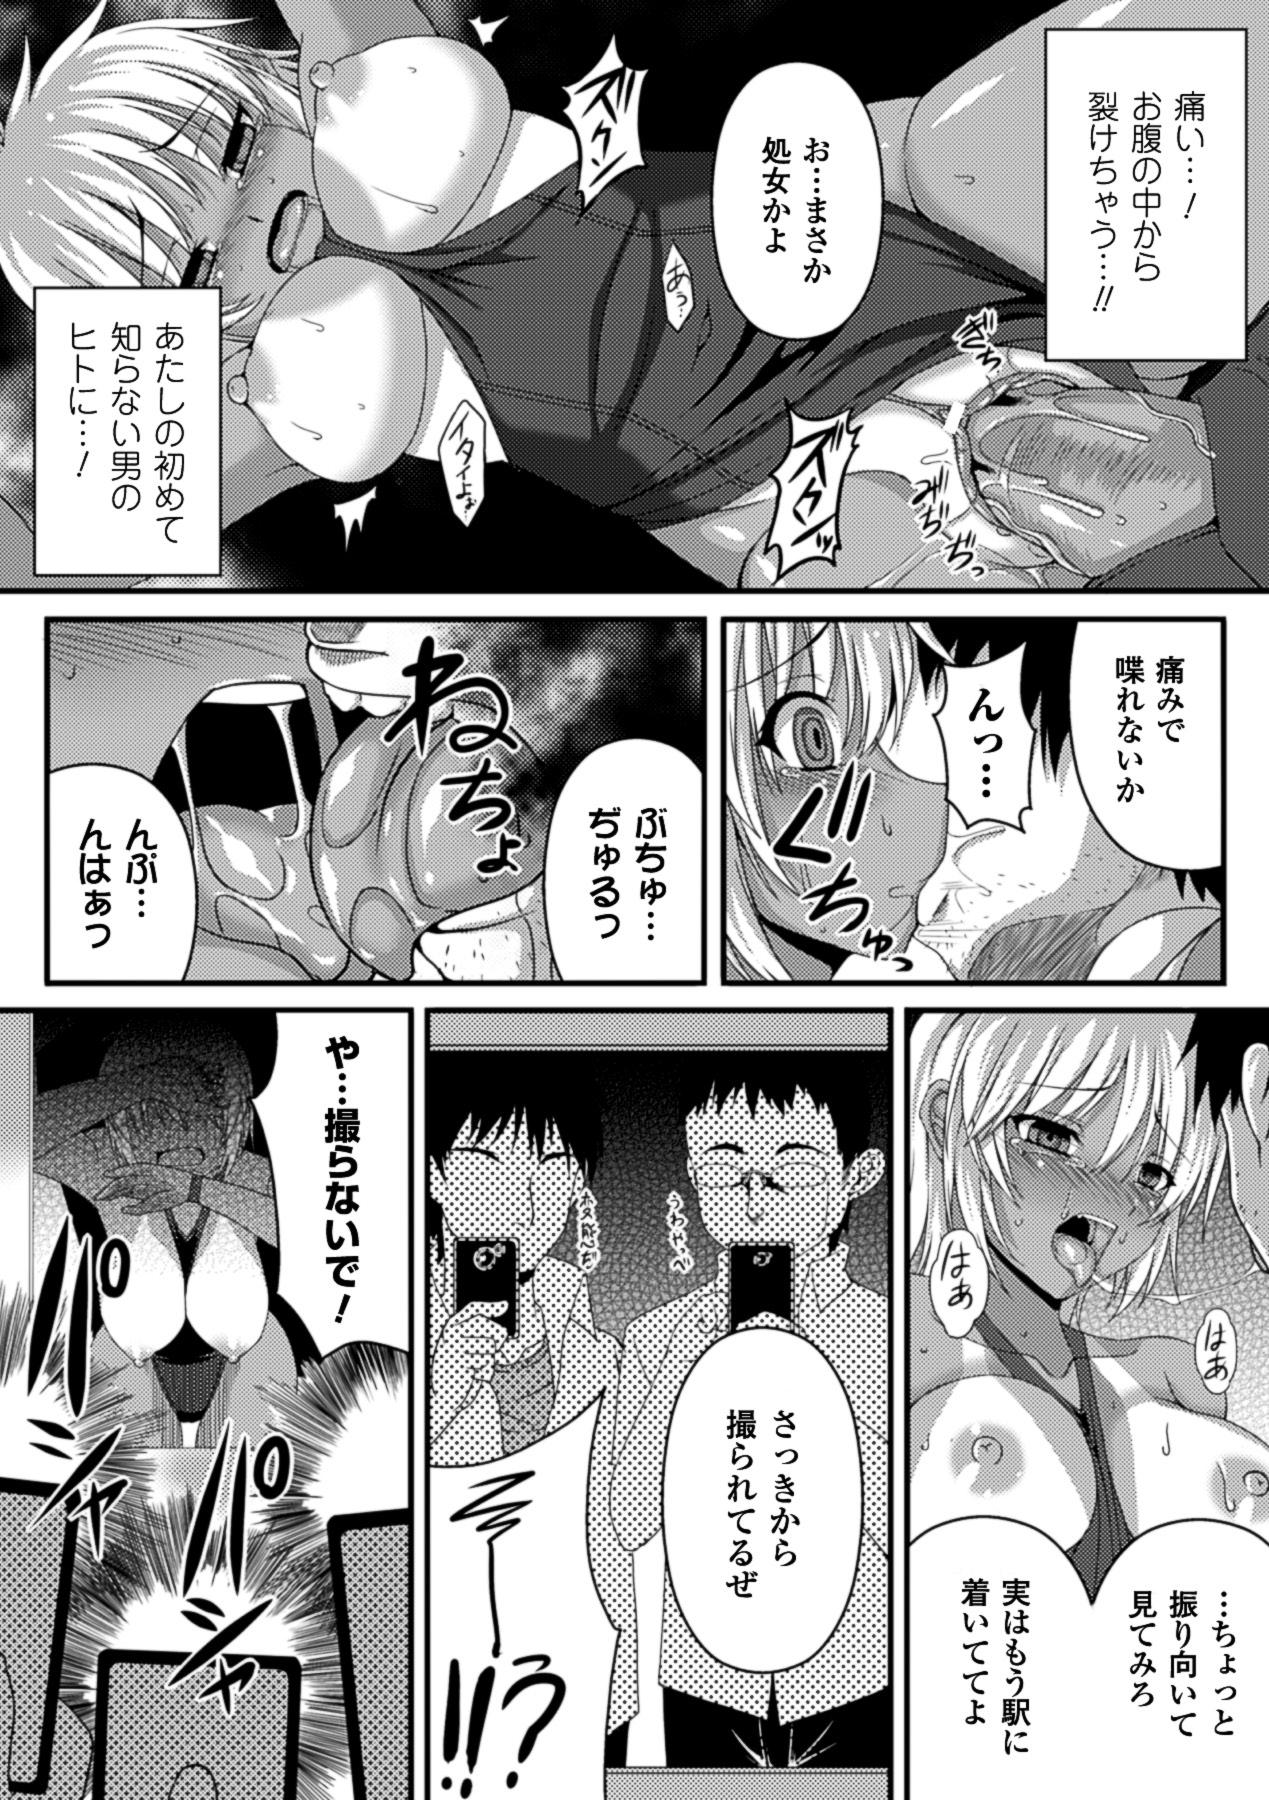 Bessatsu Comic Unreal - Joushiki ga Eroi Ijou na Sekai Vol.2 58